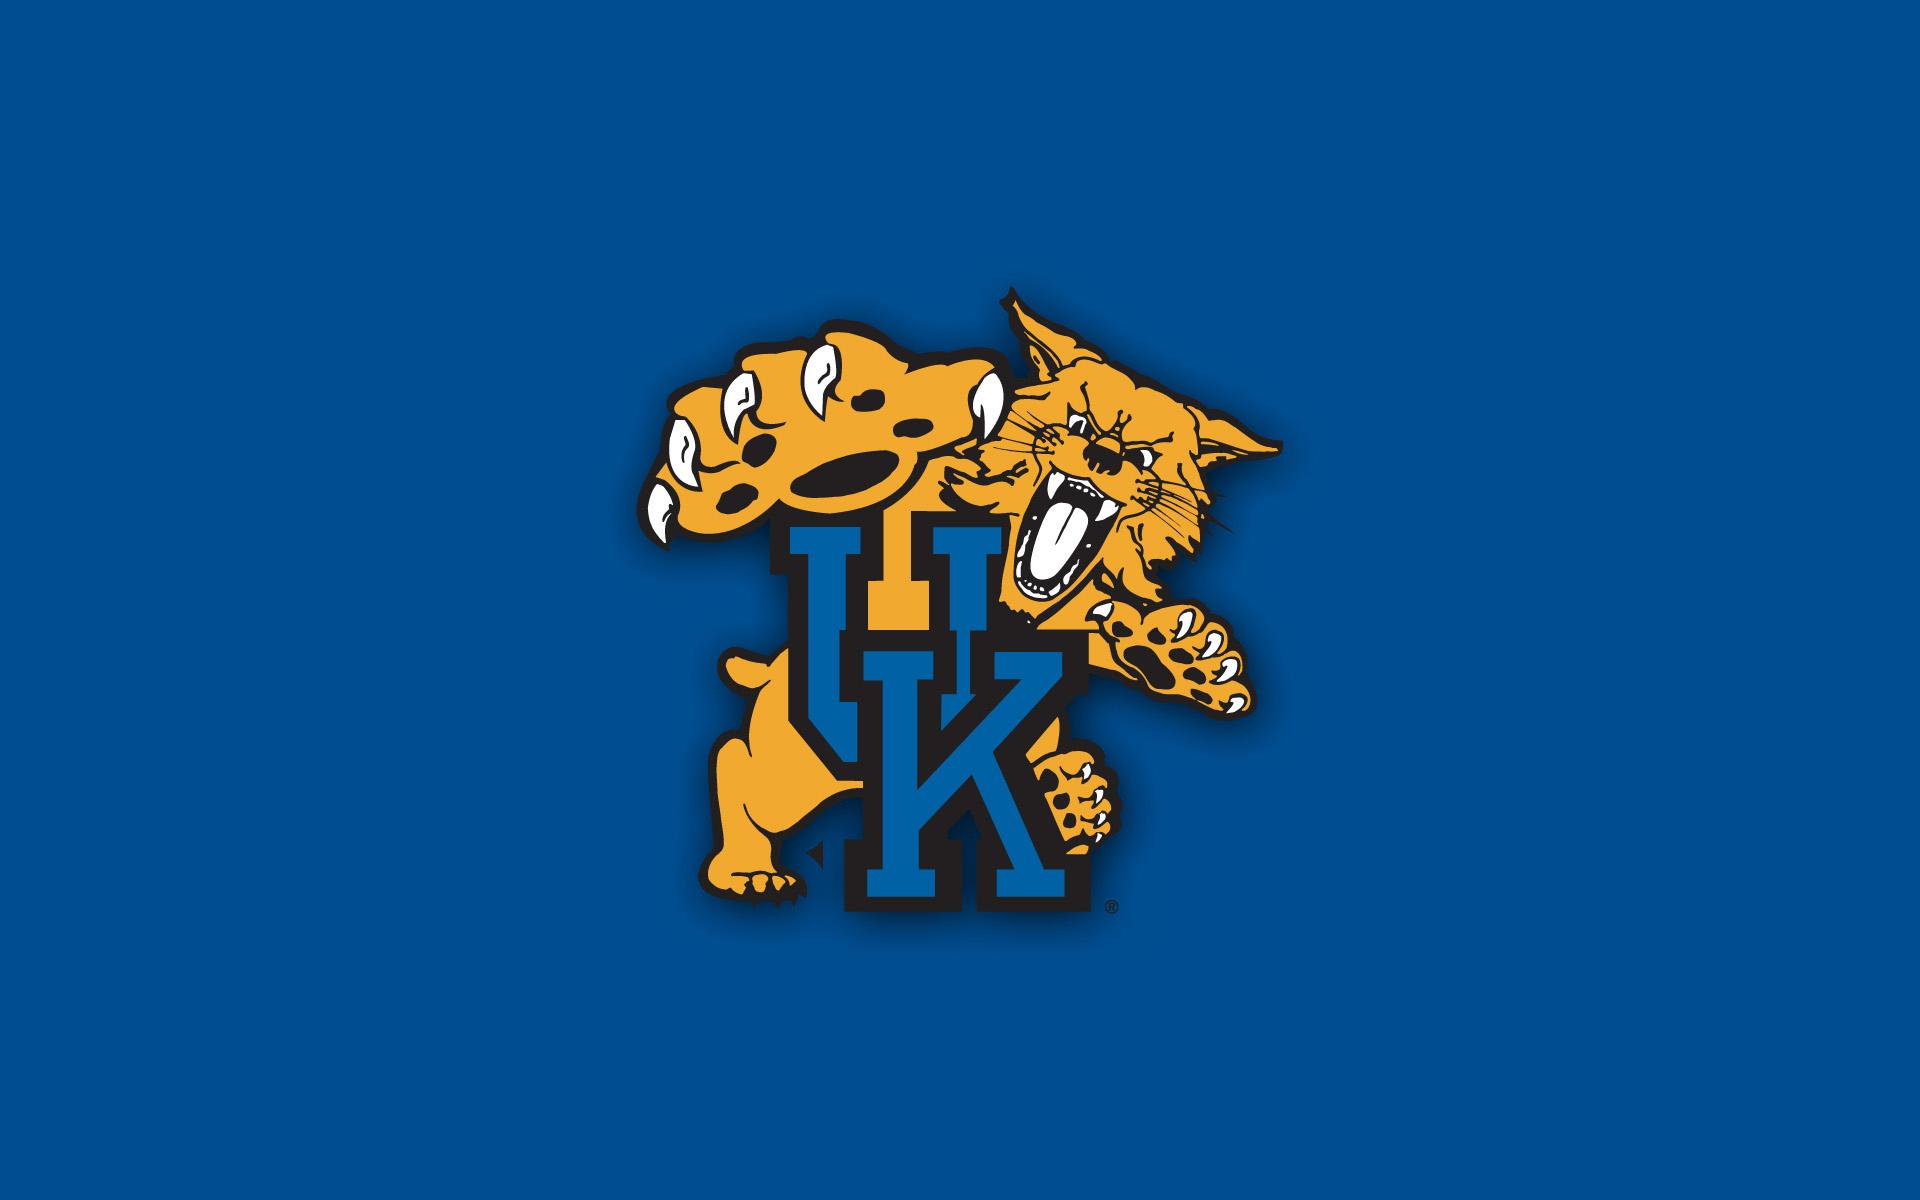 University Of Kentucky Wildcats wallpaper   1414751 1920x1200